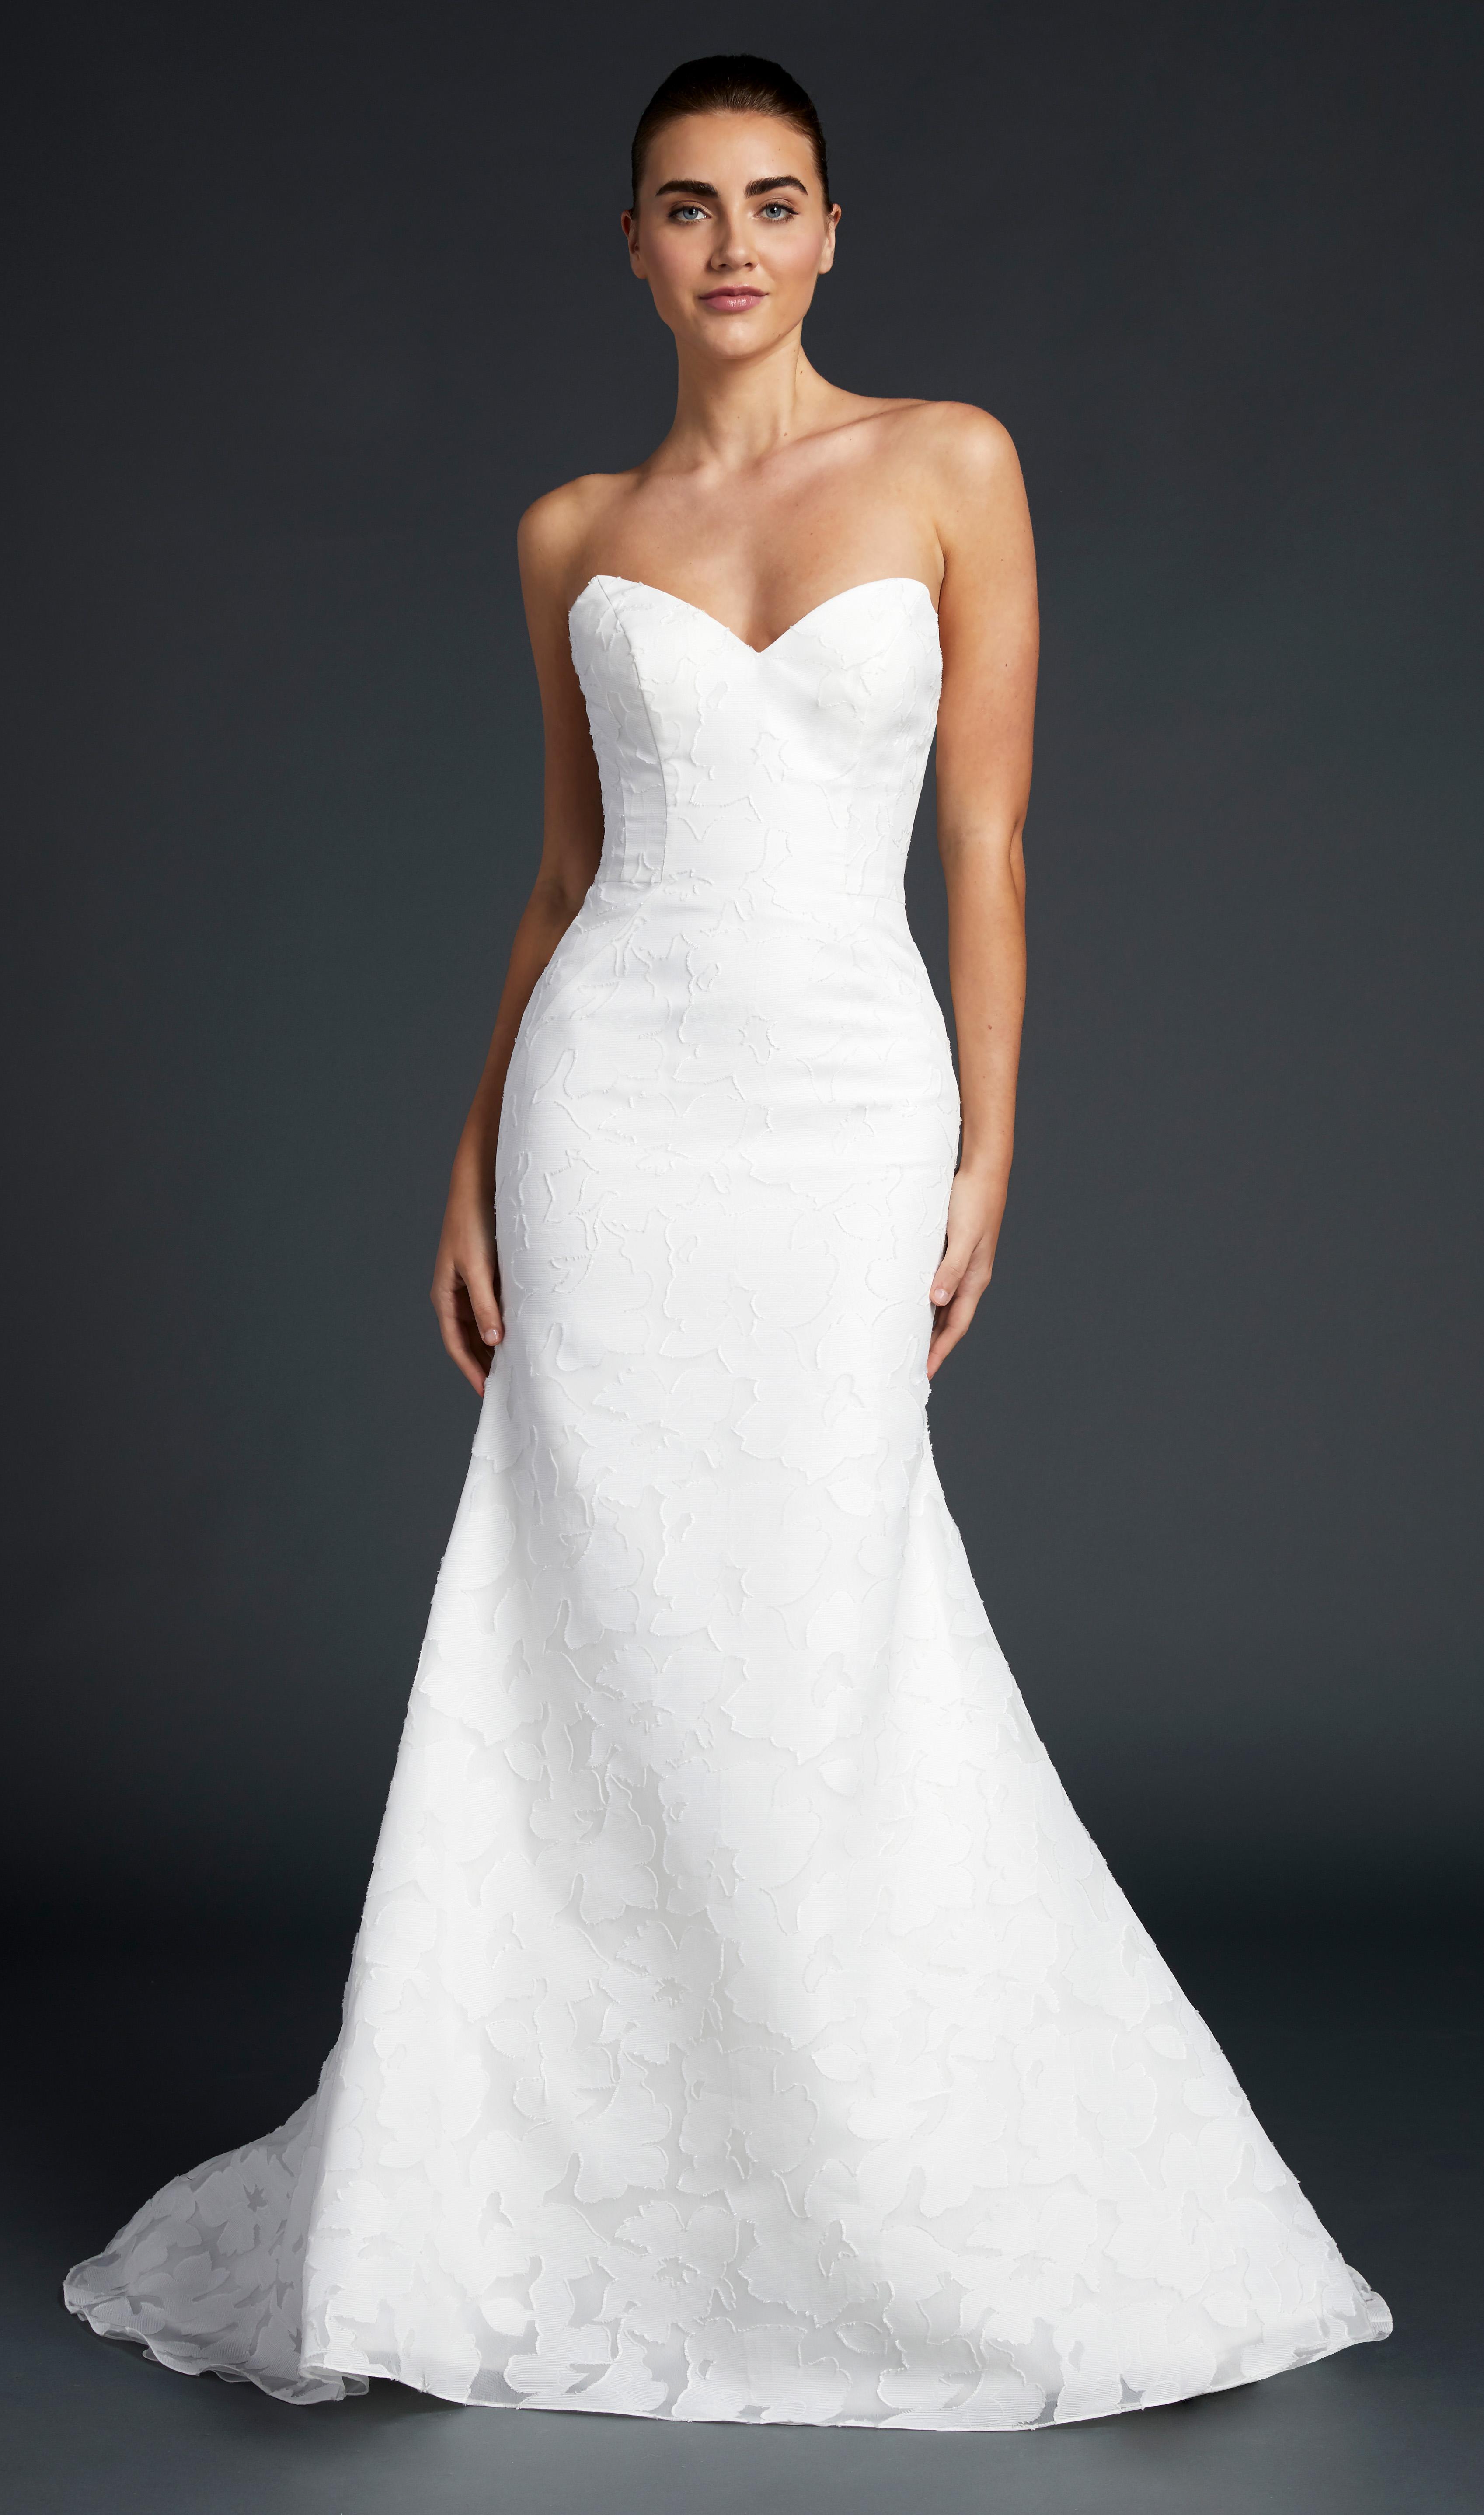 blue willow wedding dress strapless trumpet sweetheart